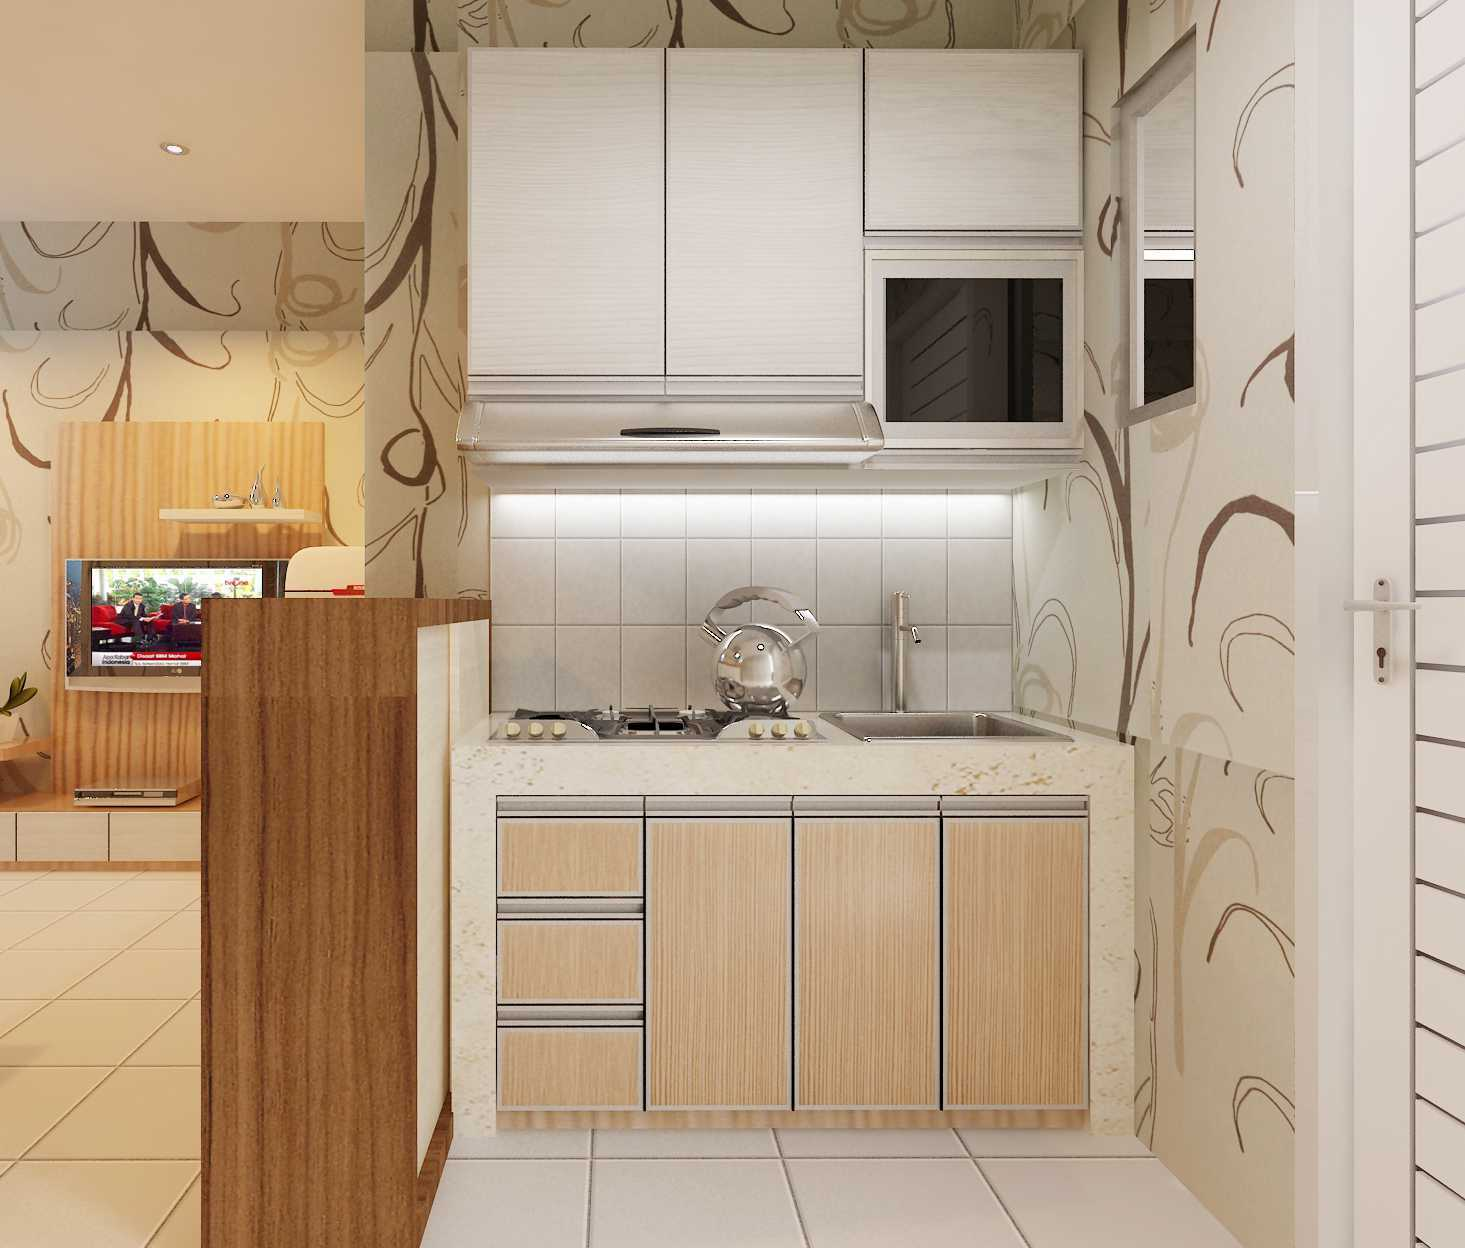 Foto inspirasi ide desain dapur minimalis Kitchenset oleh Yohanes Khouw di Arsitag